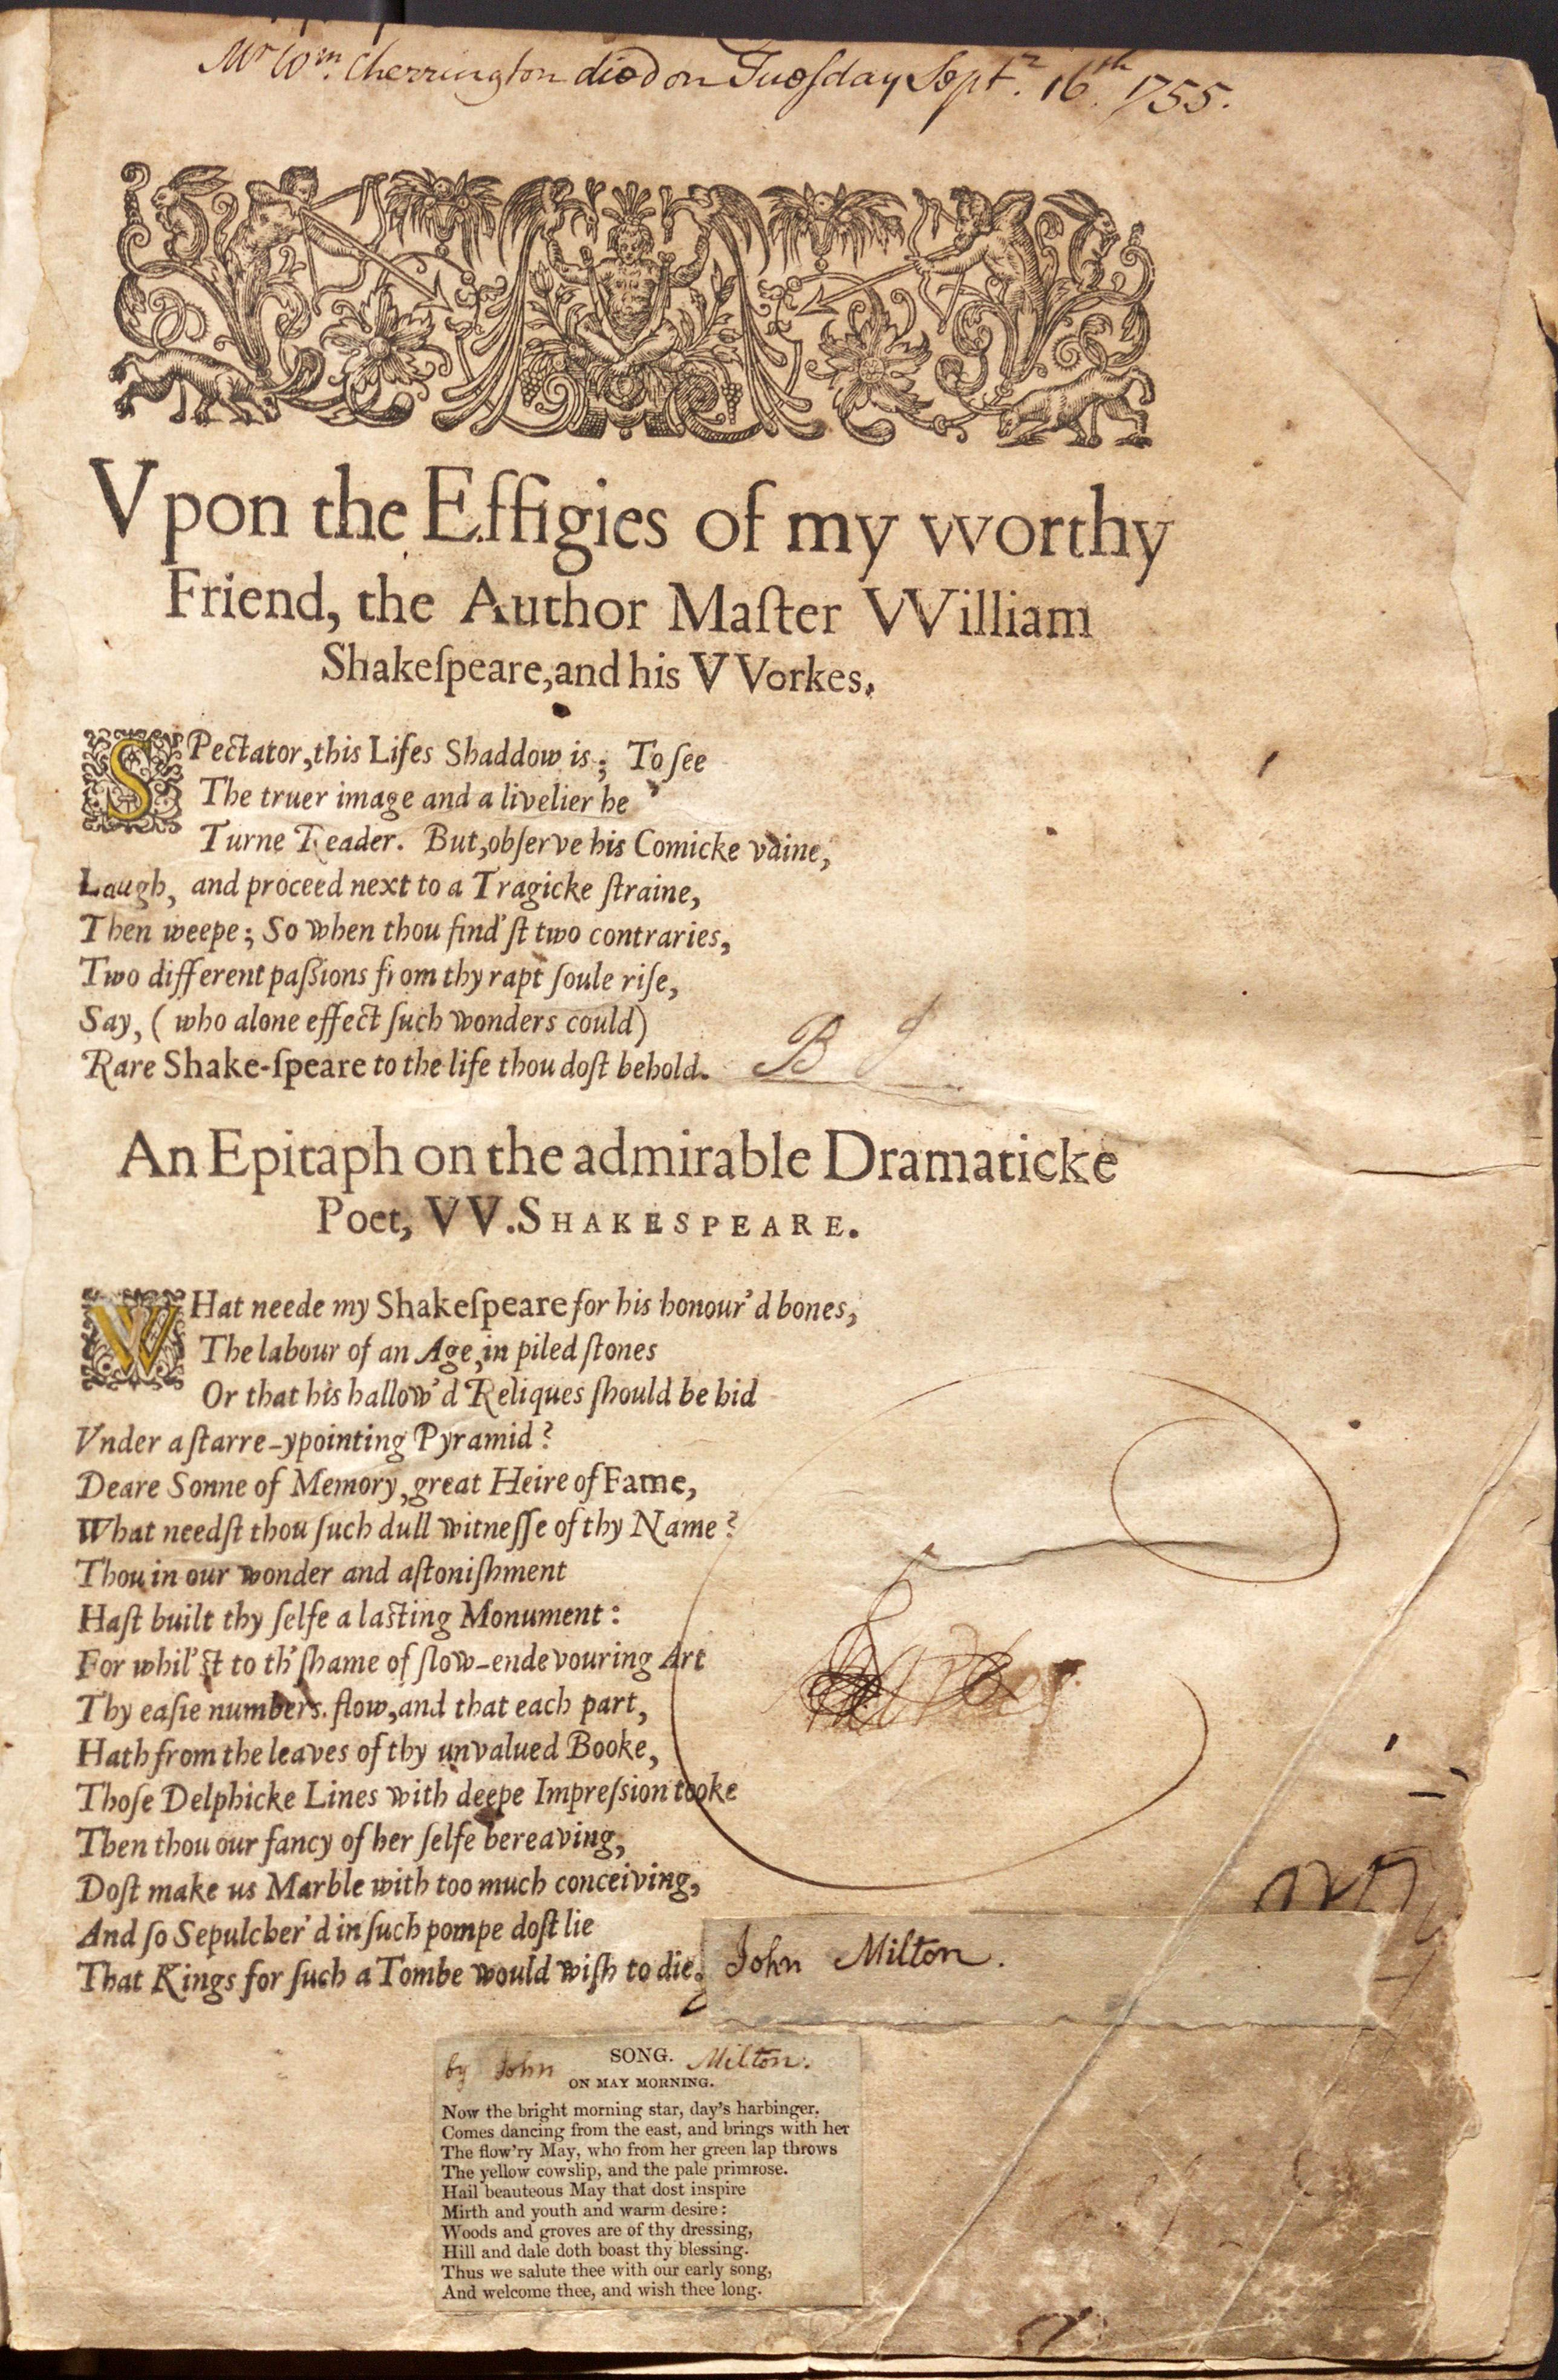 John Milton S Dedicatory Poem To Shakespeare Included In